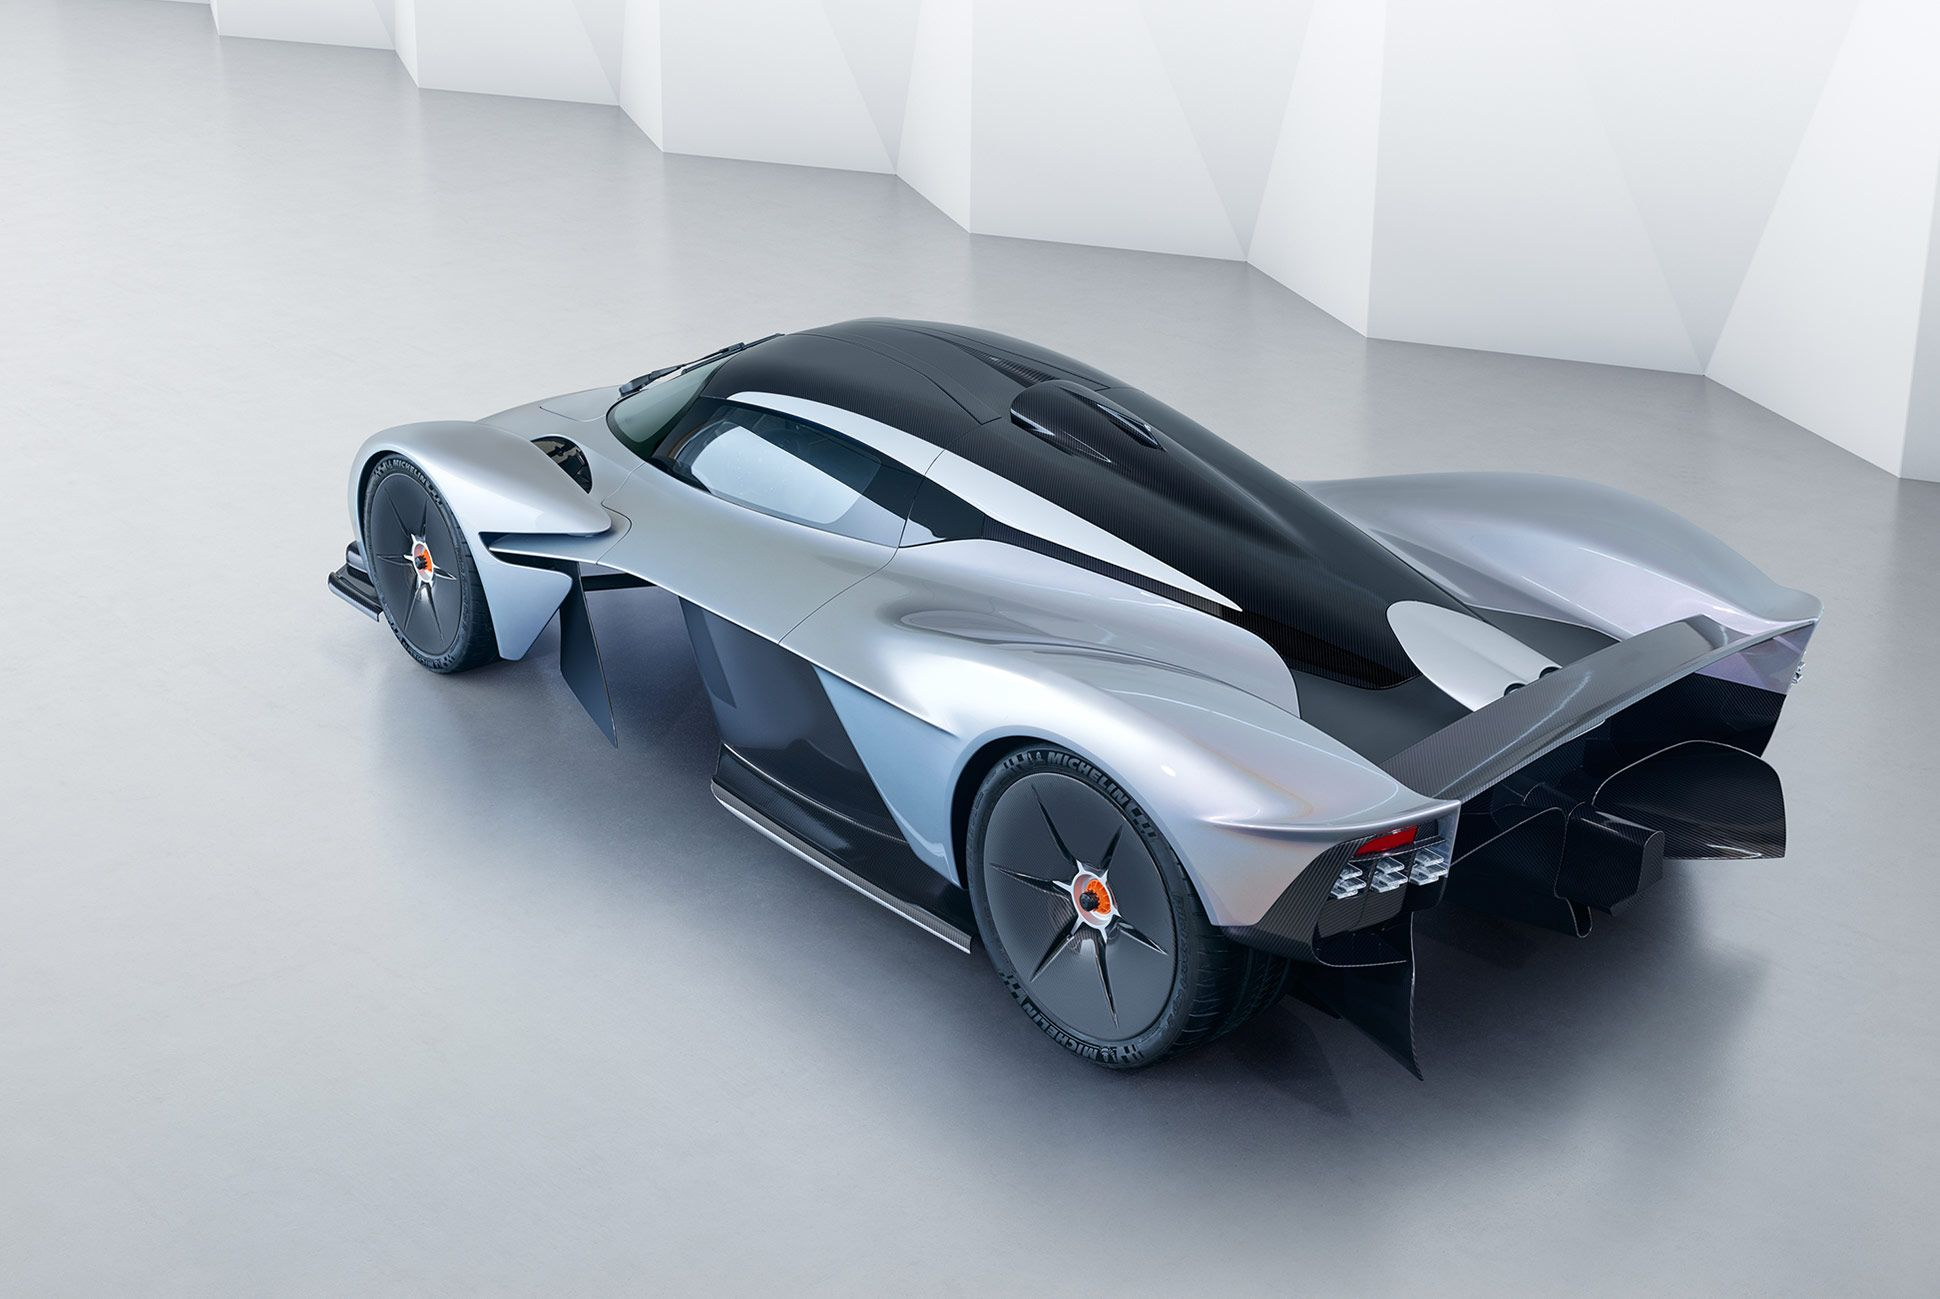 Aston-Martin-Valkyrie-Gear-Patrol-8